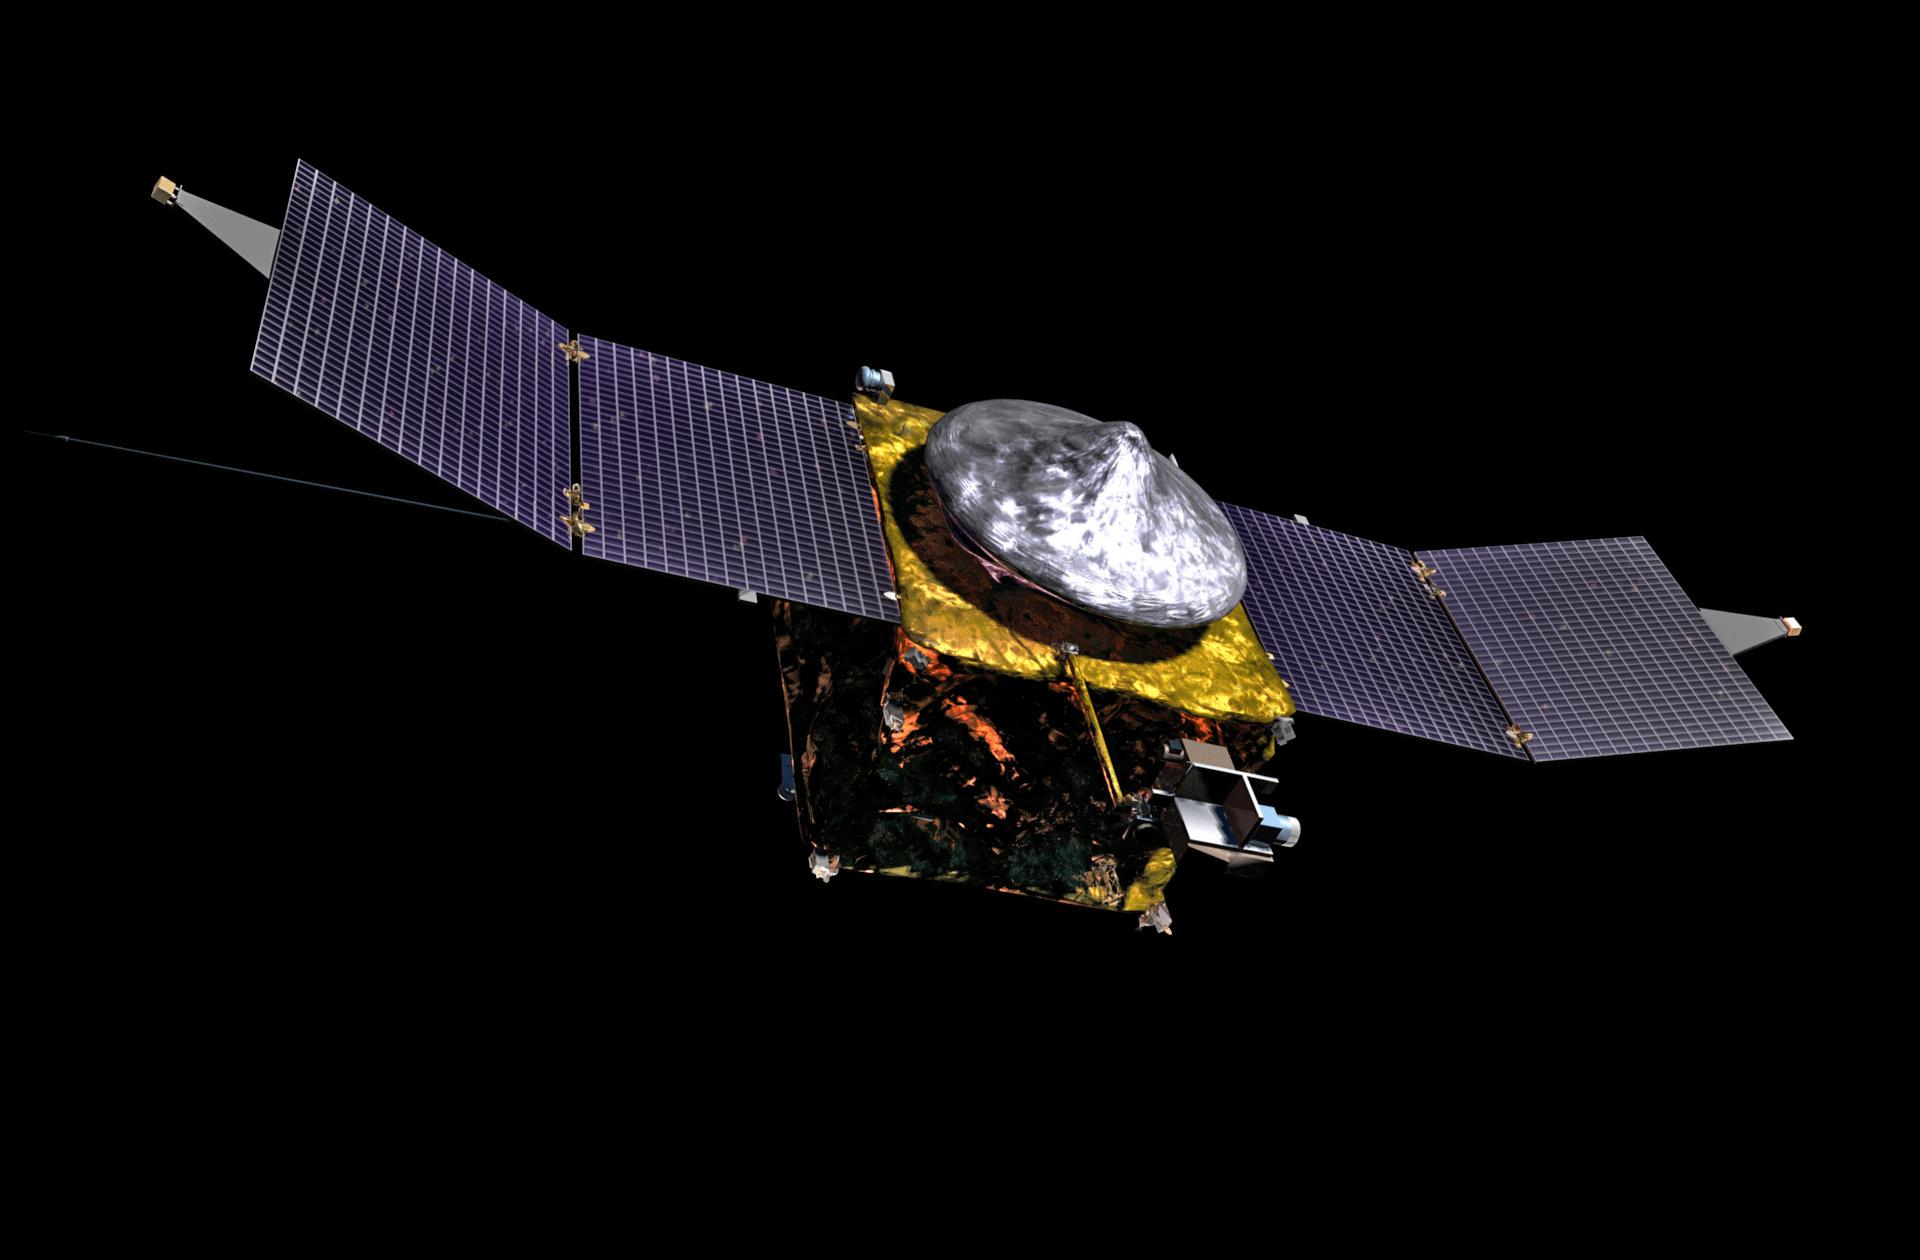 maven space probe to mars november 18 2017 - photo #6